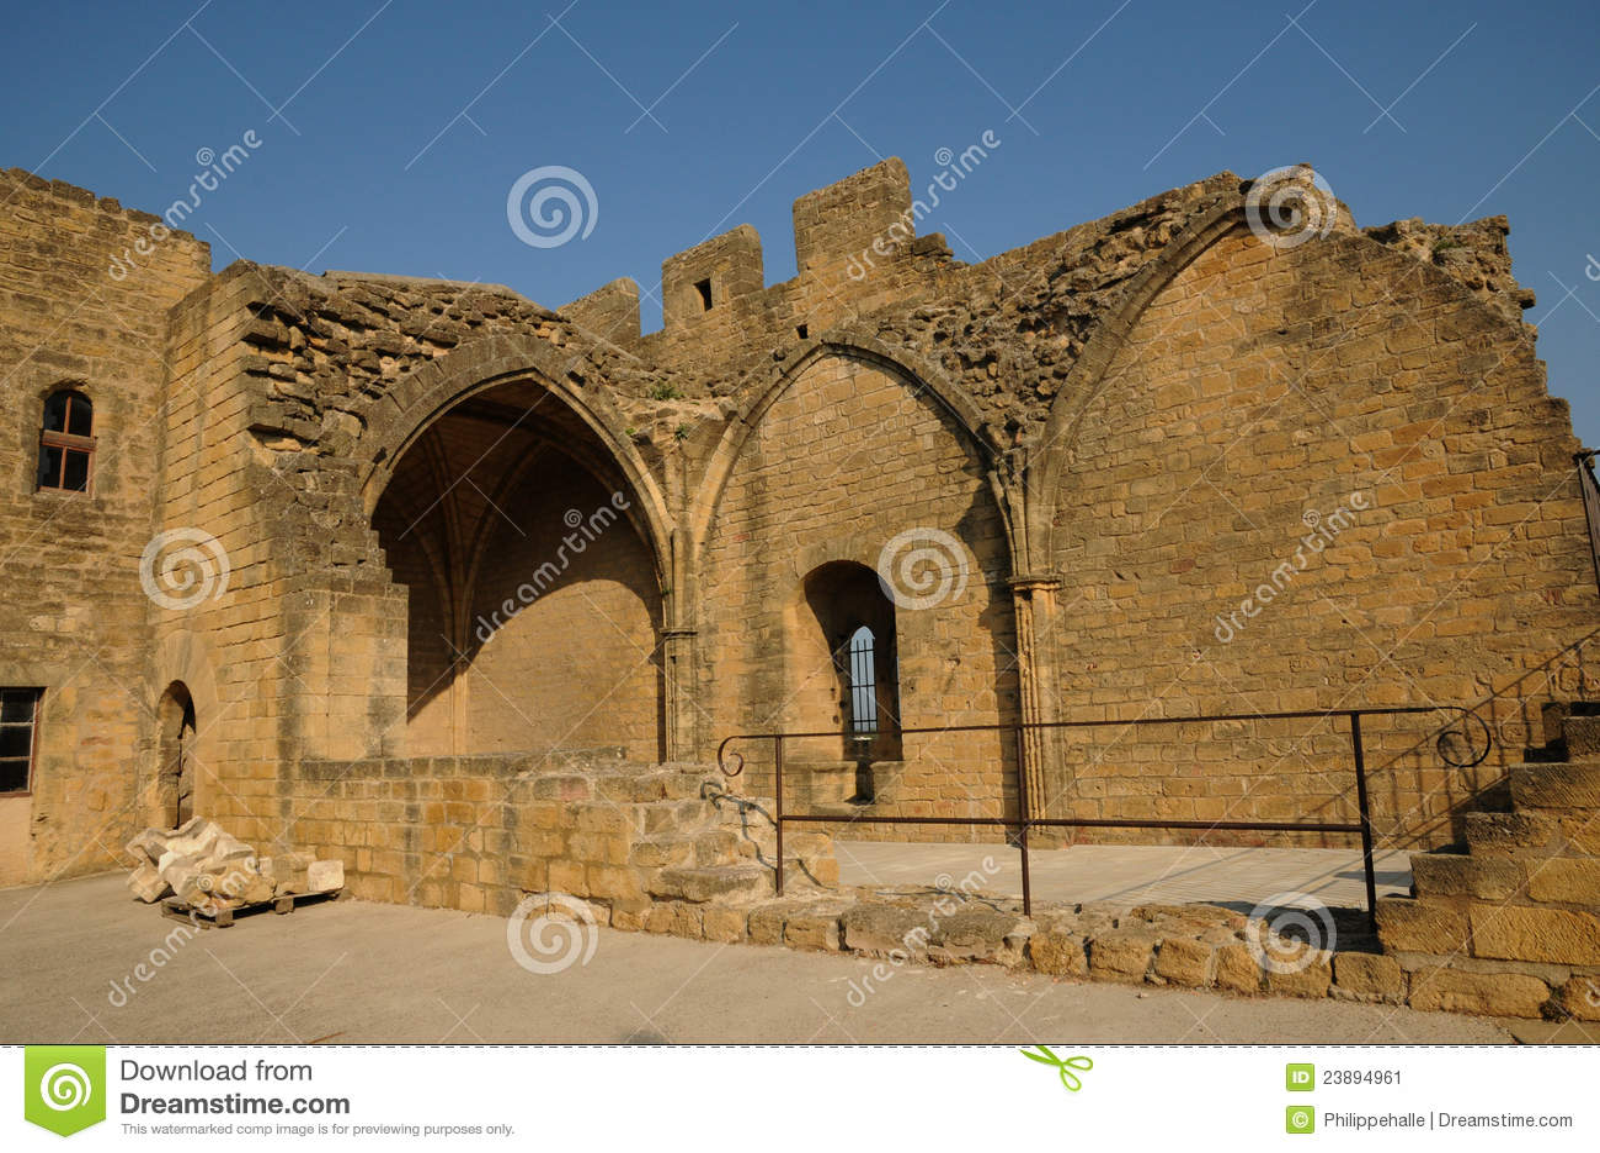 Le chateau de l emperi in salon de provence stock image for Salon de provence